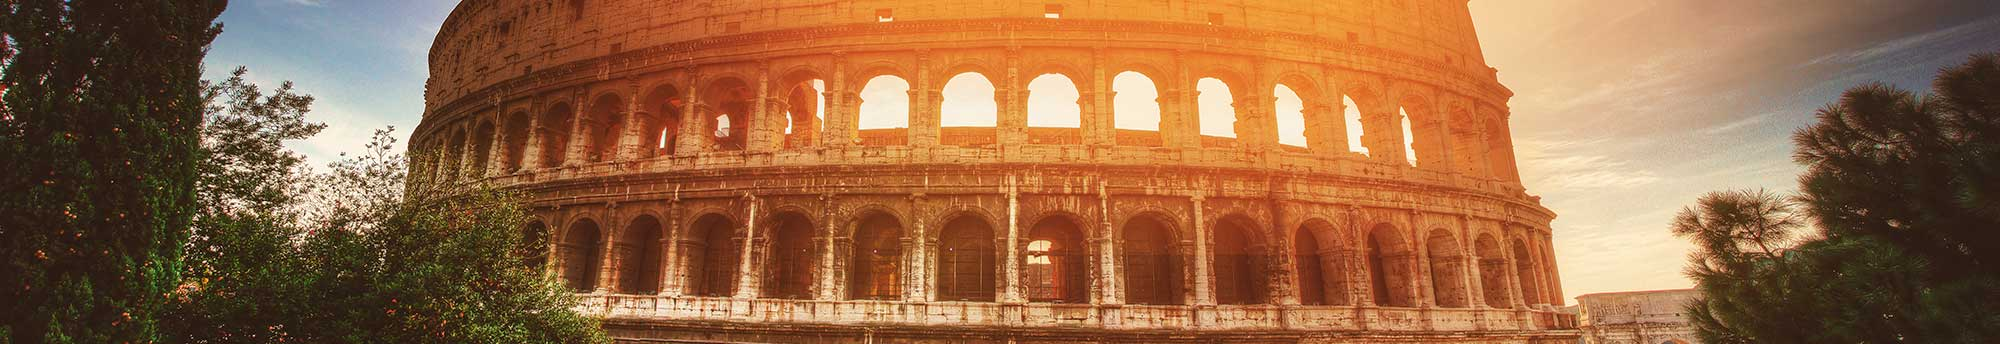 Visita guiada Coliseo Romano, Foro Romano y Monte Palatino